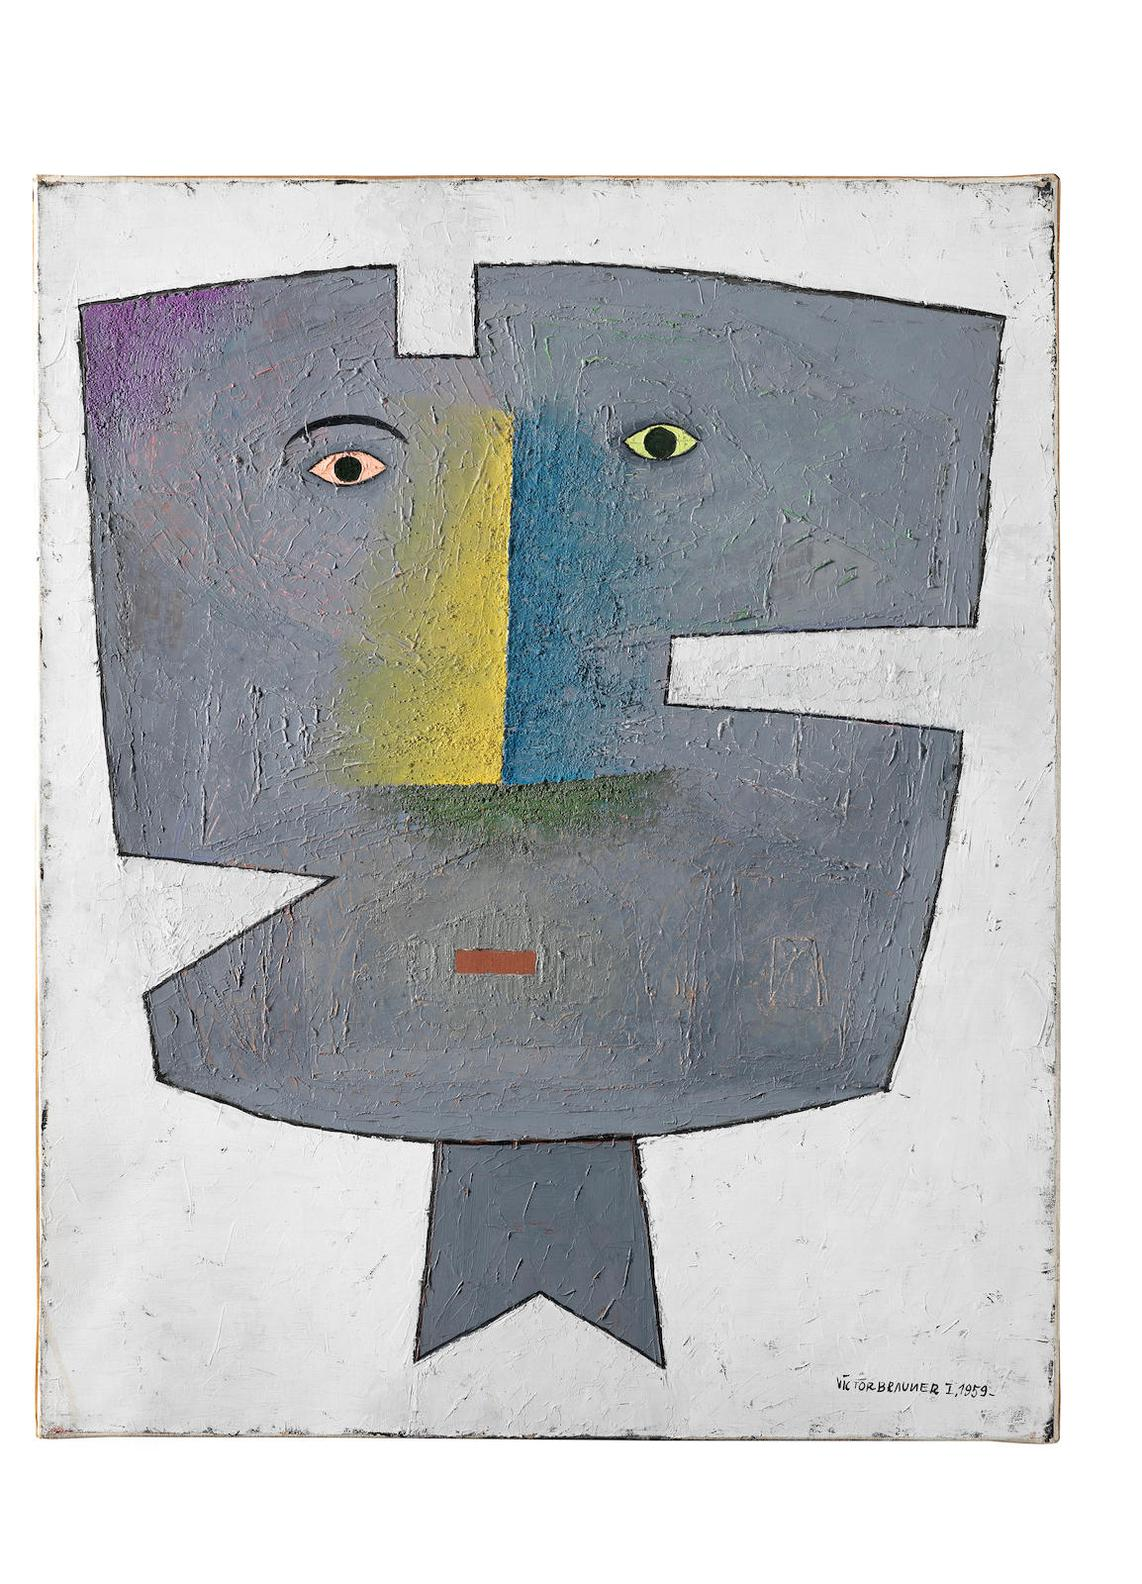 Victor Brauner-Reconstruction De Letre Aime II-1959